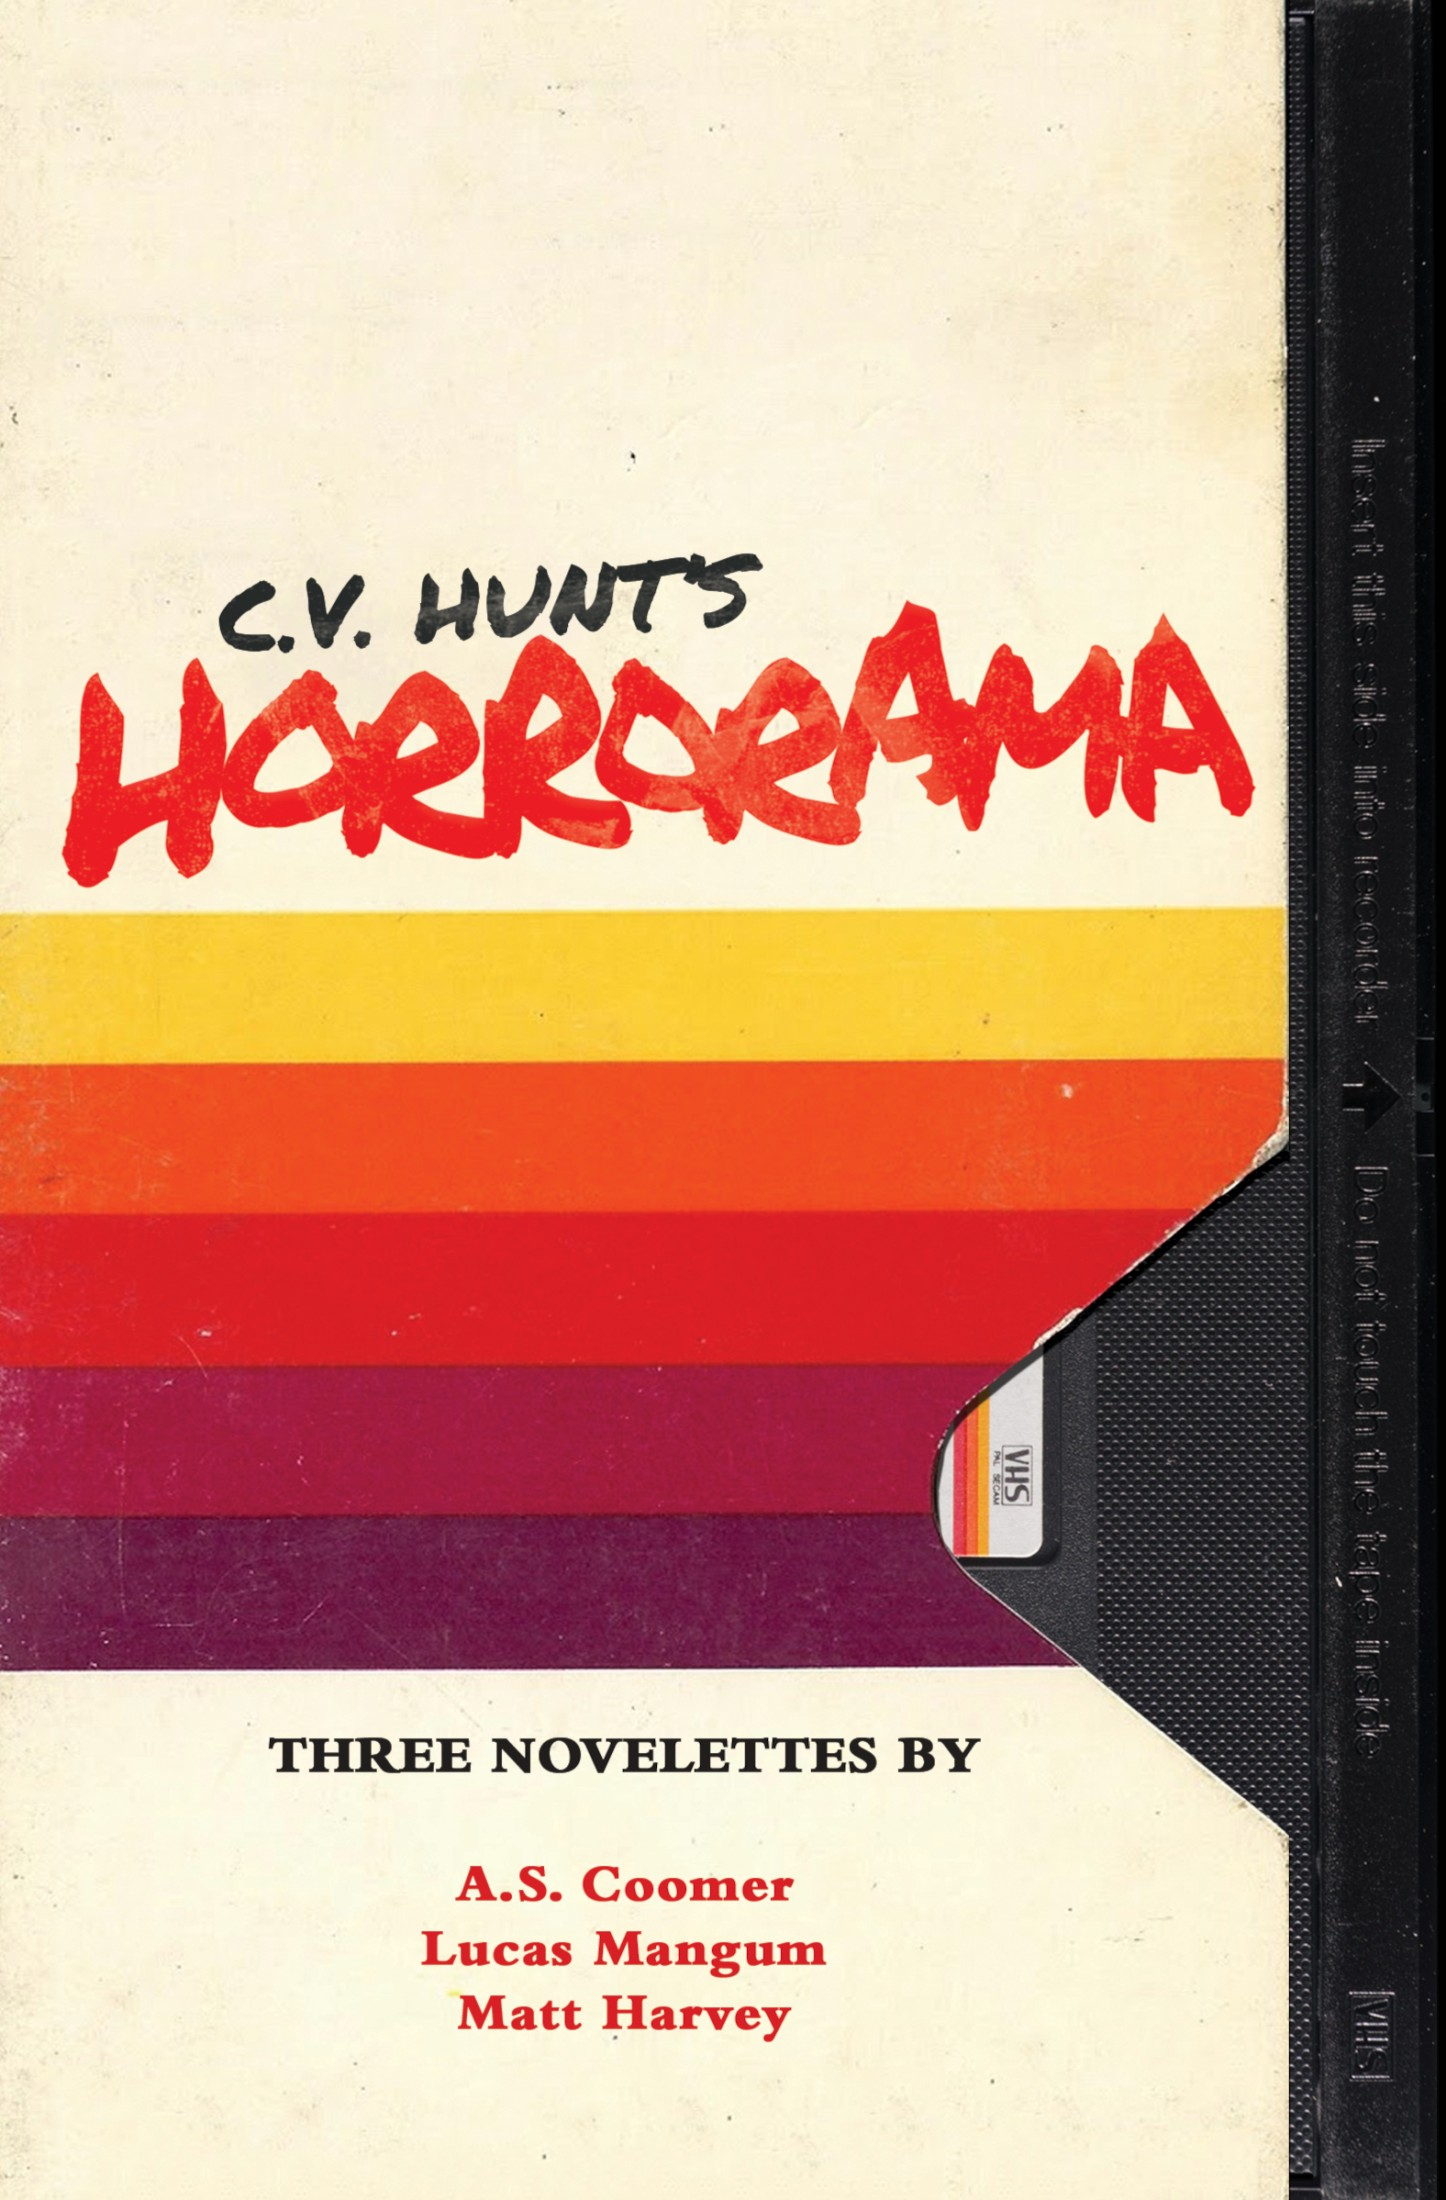 Horrorama Cover